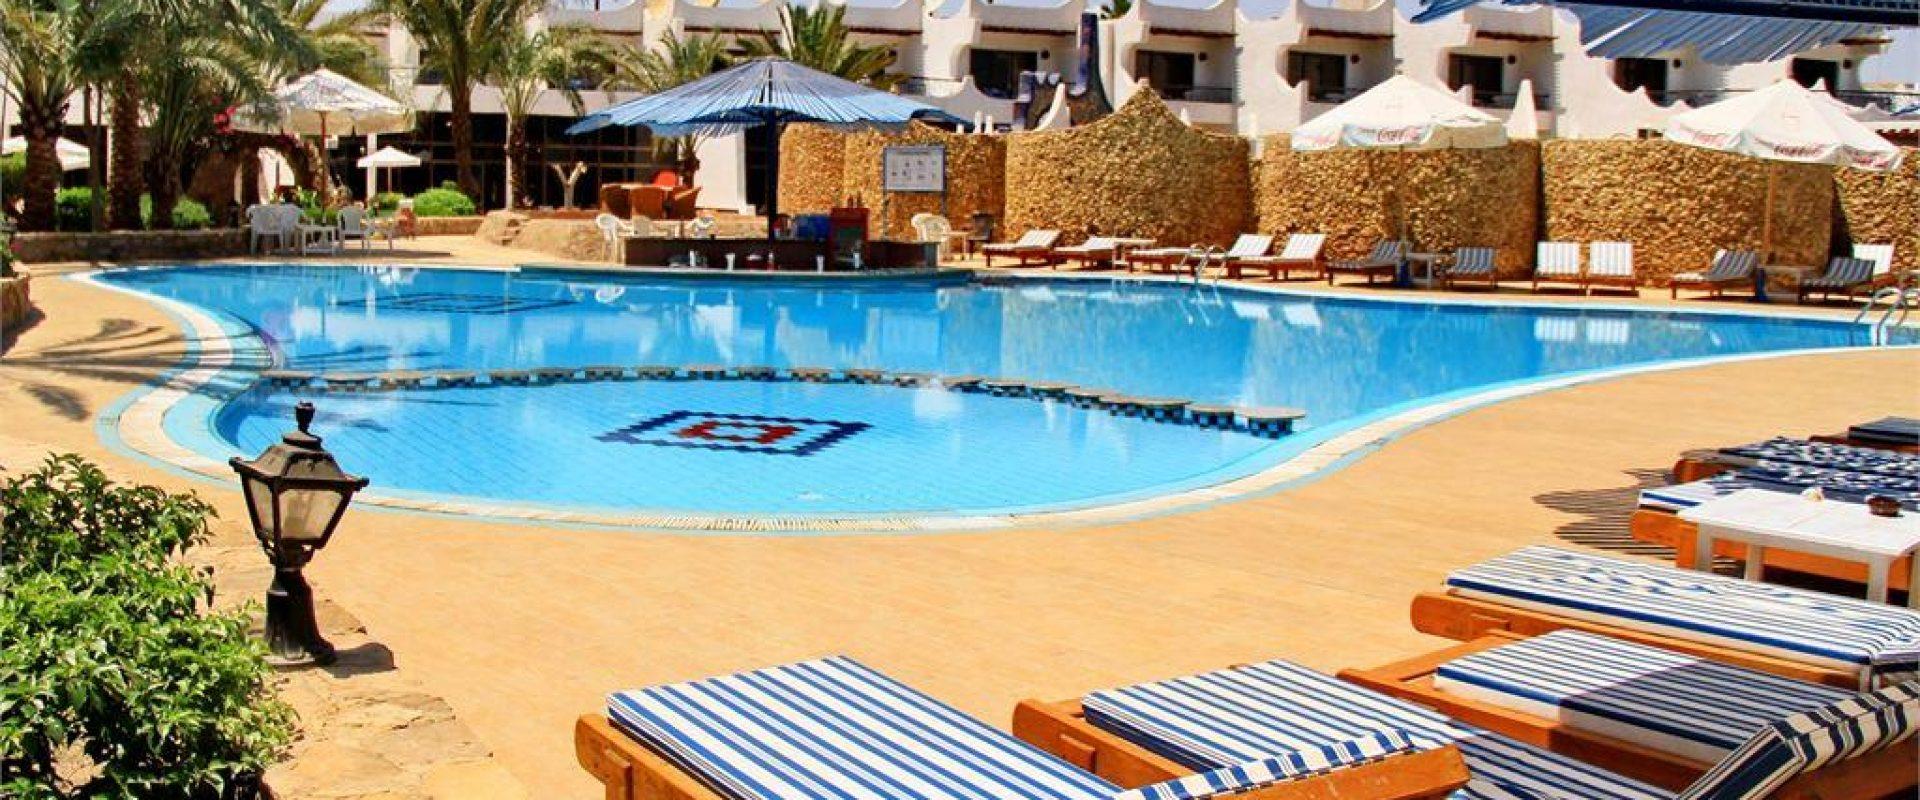 Vacanță în Egipt, Sharm El Sheikh, Hotel Turquoise Beach